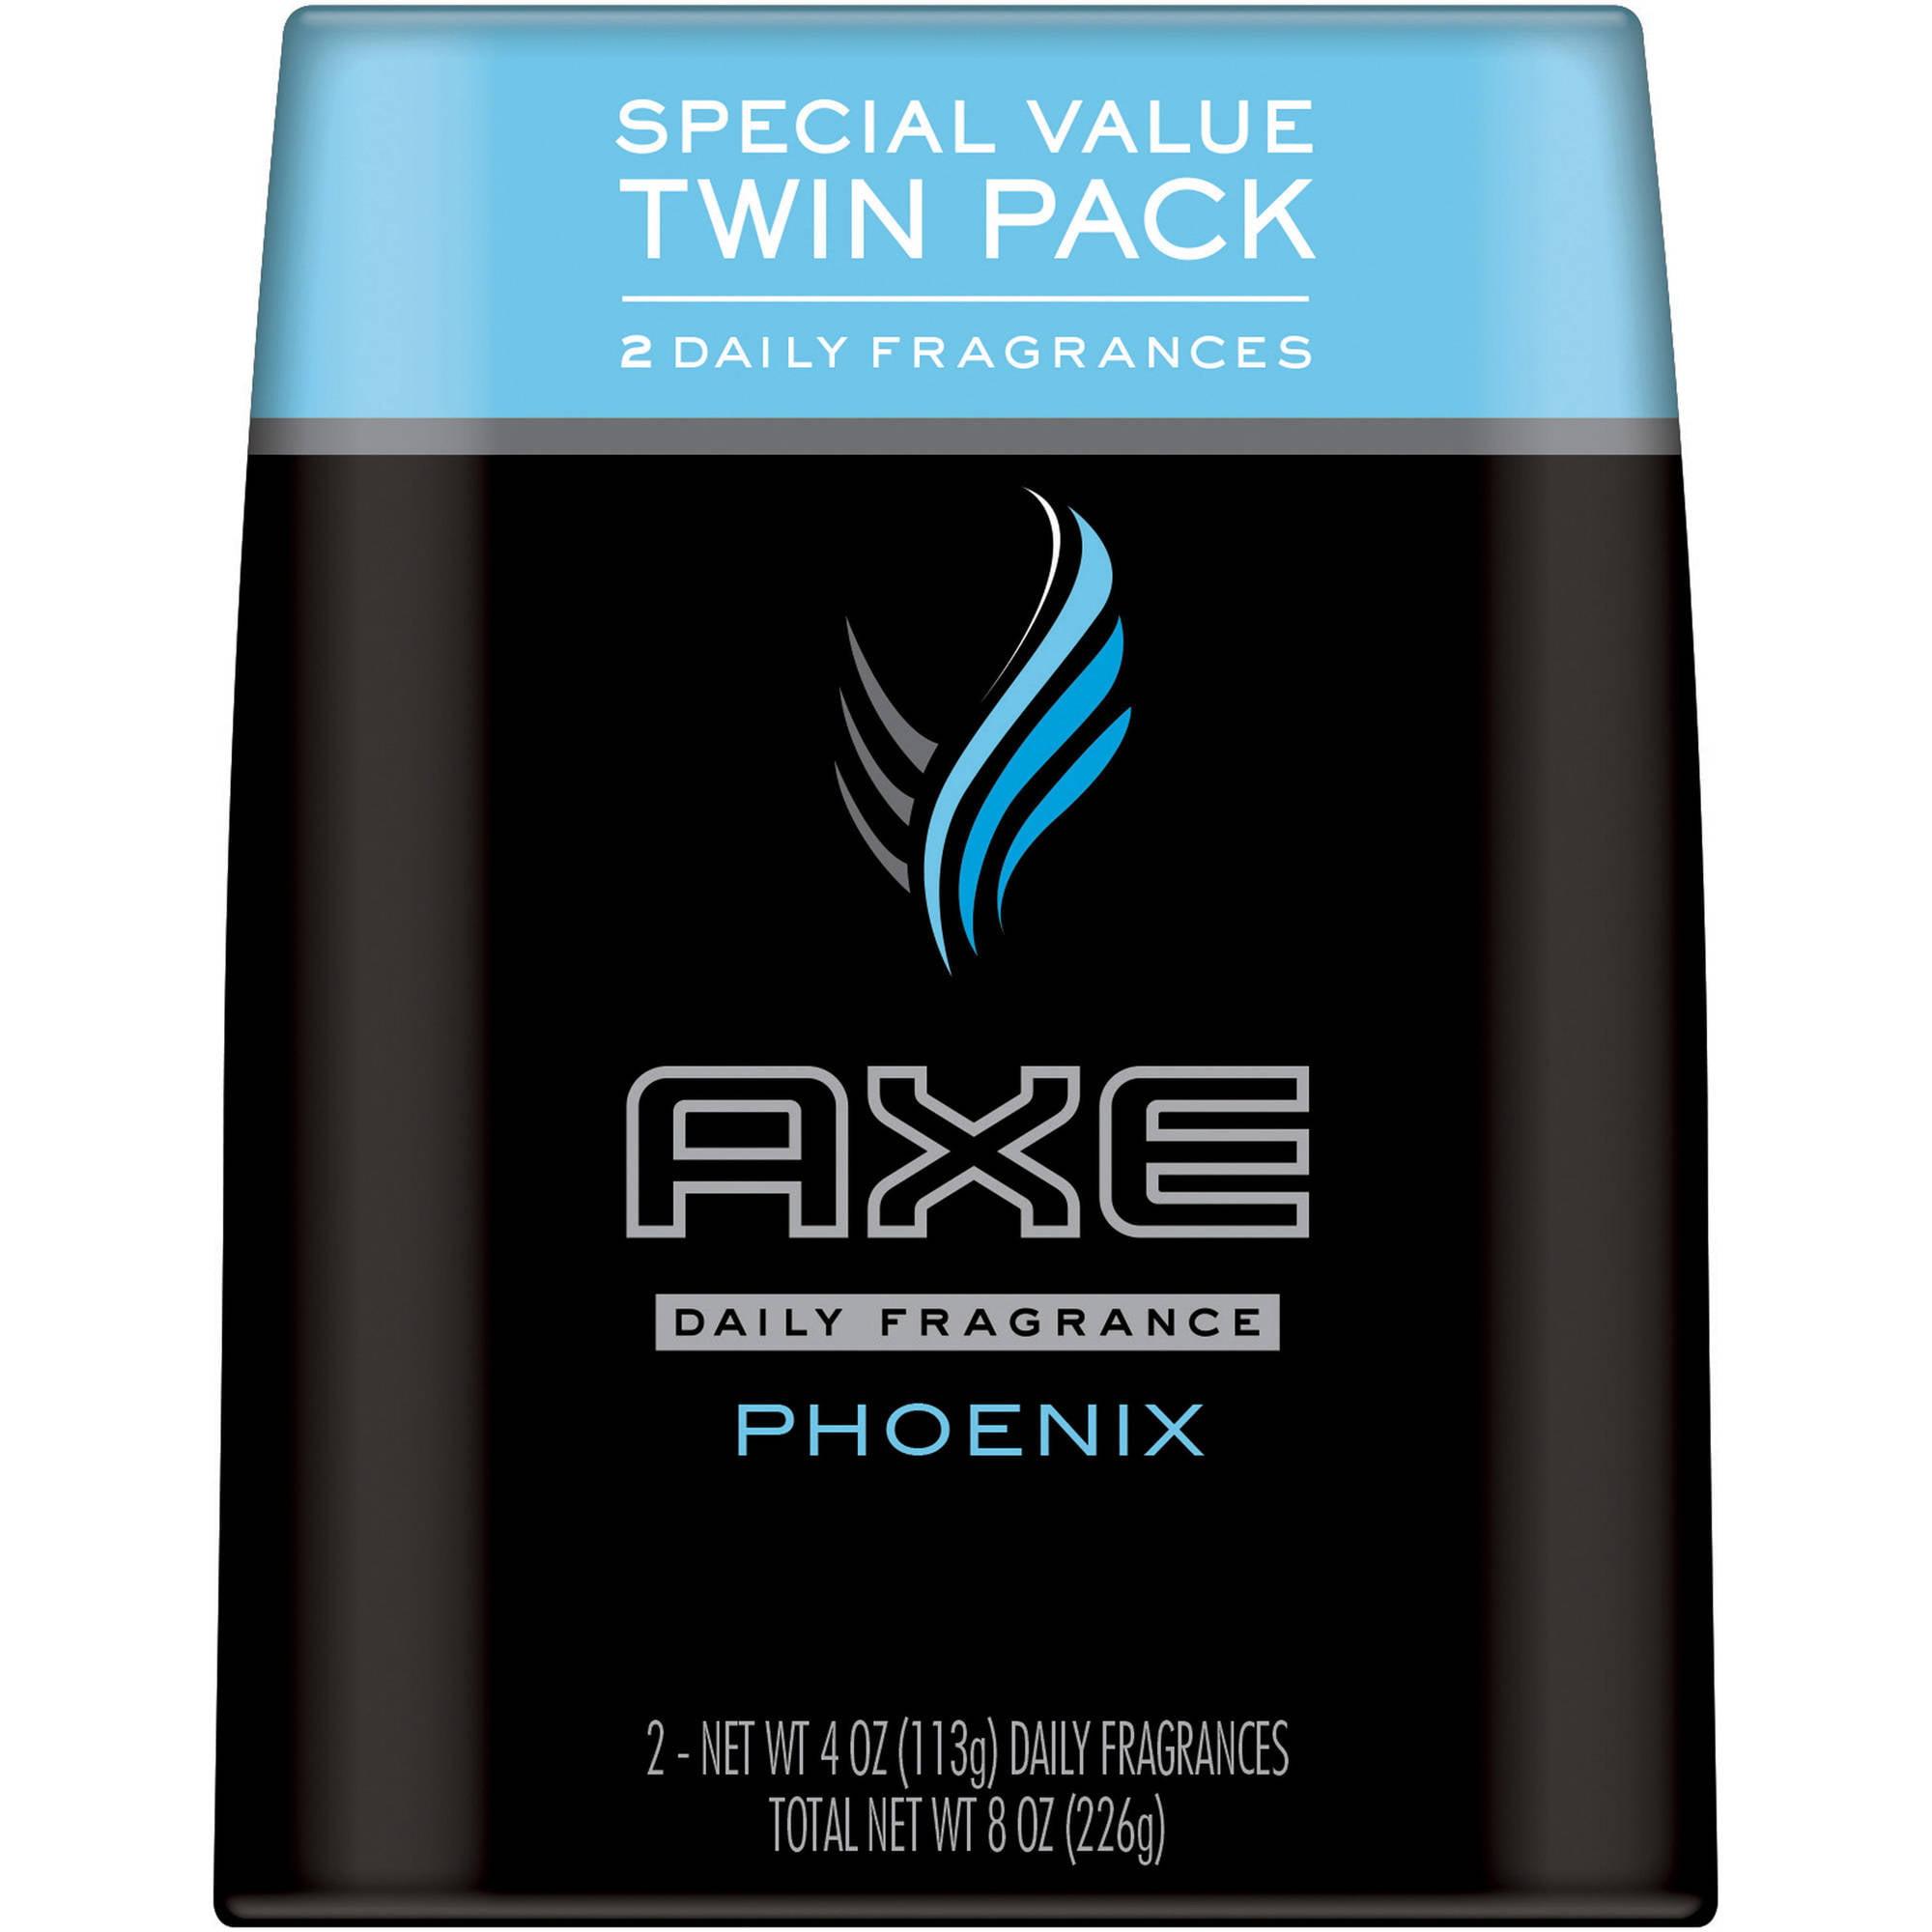 AXE Phoenix Body Spray for Men, 4 oz, Twin Pack